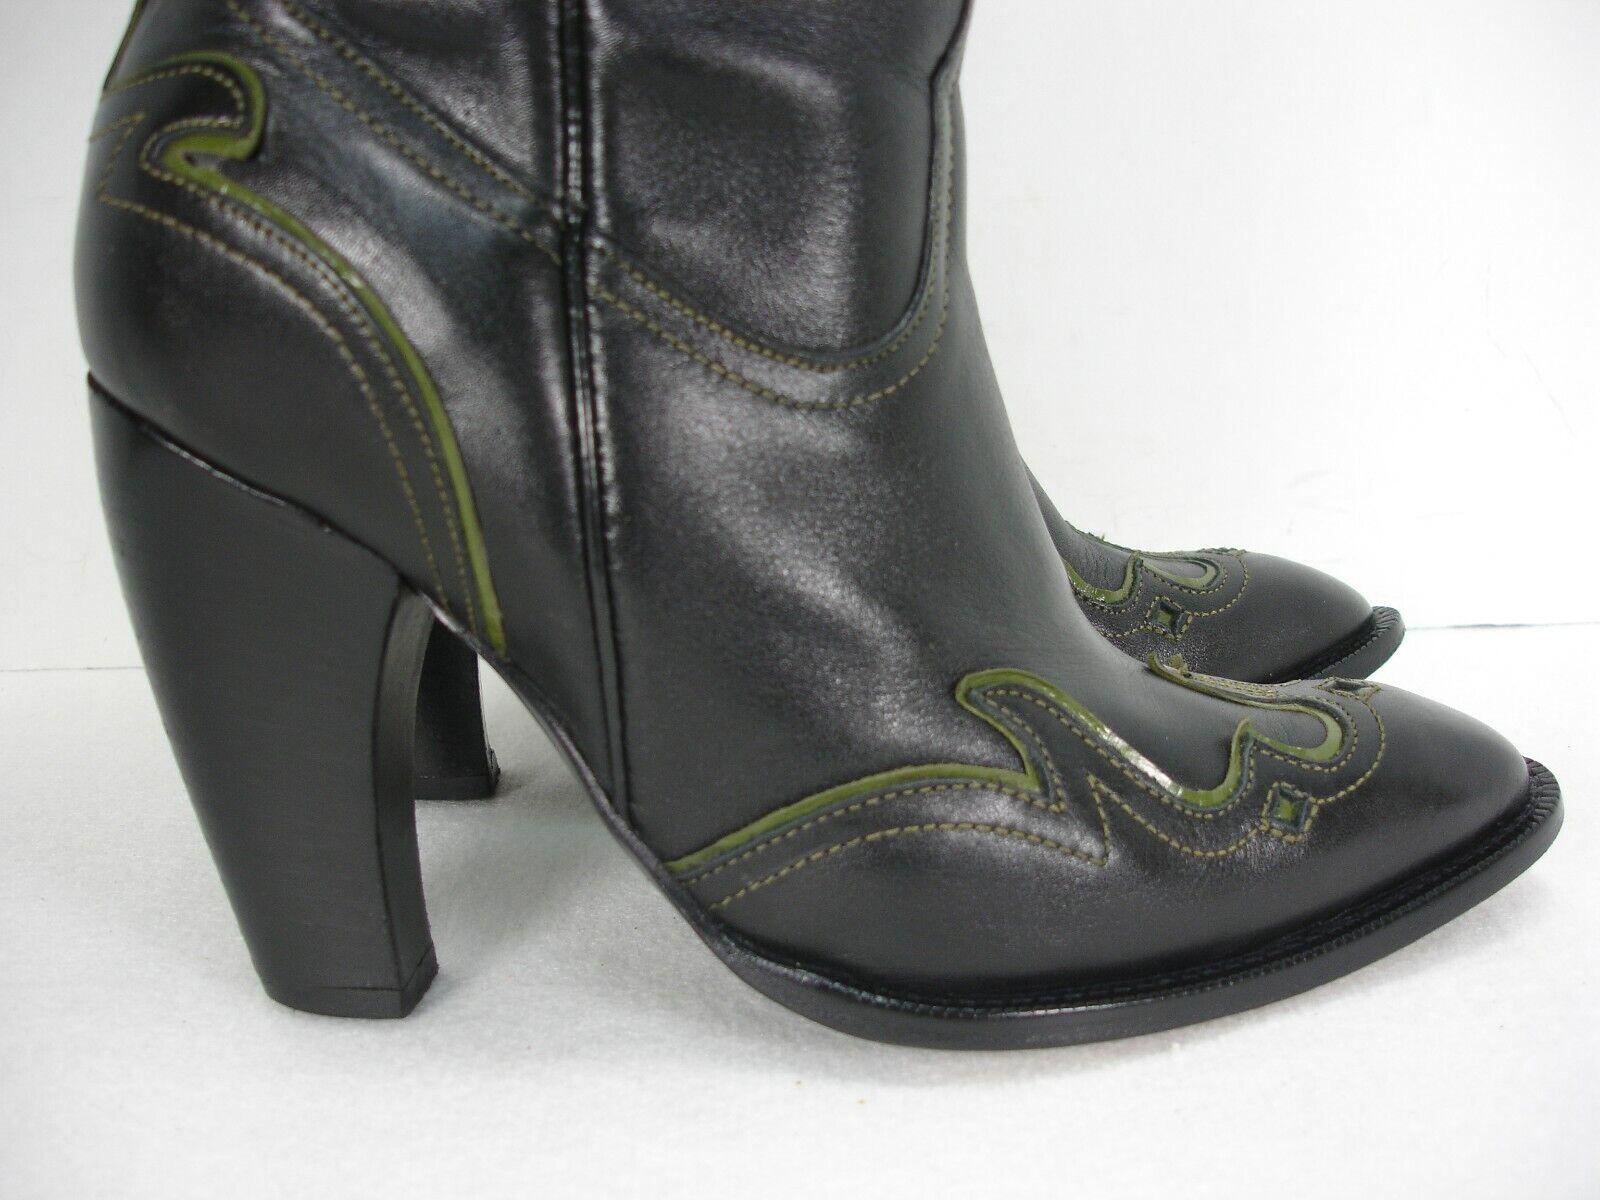 JUSTIN 7852 BLACK GREEN OVERLAY OVERLAY OVERLAY CURVED HEEL COWBOY WESTERN BOOTS WOMEN'S 6.5 B c2e4d3